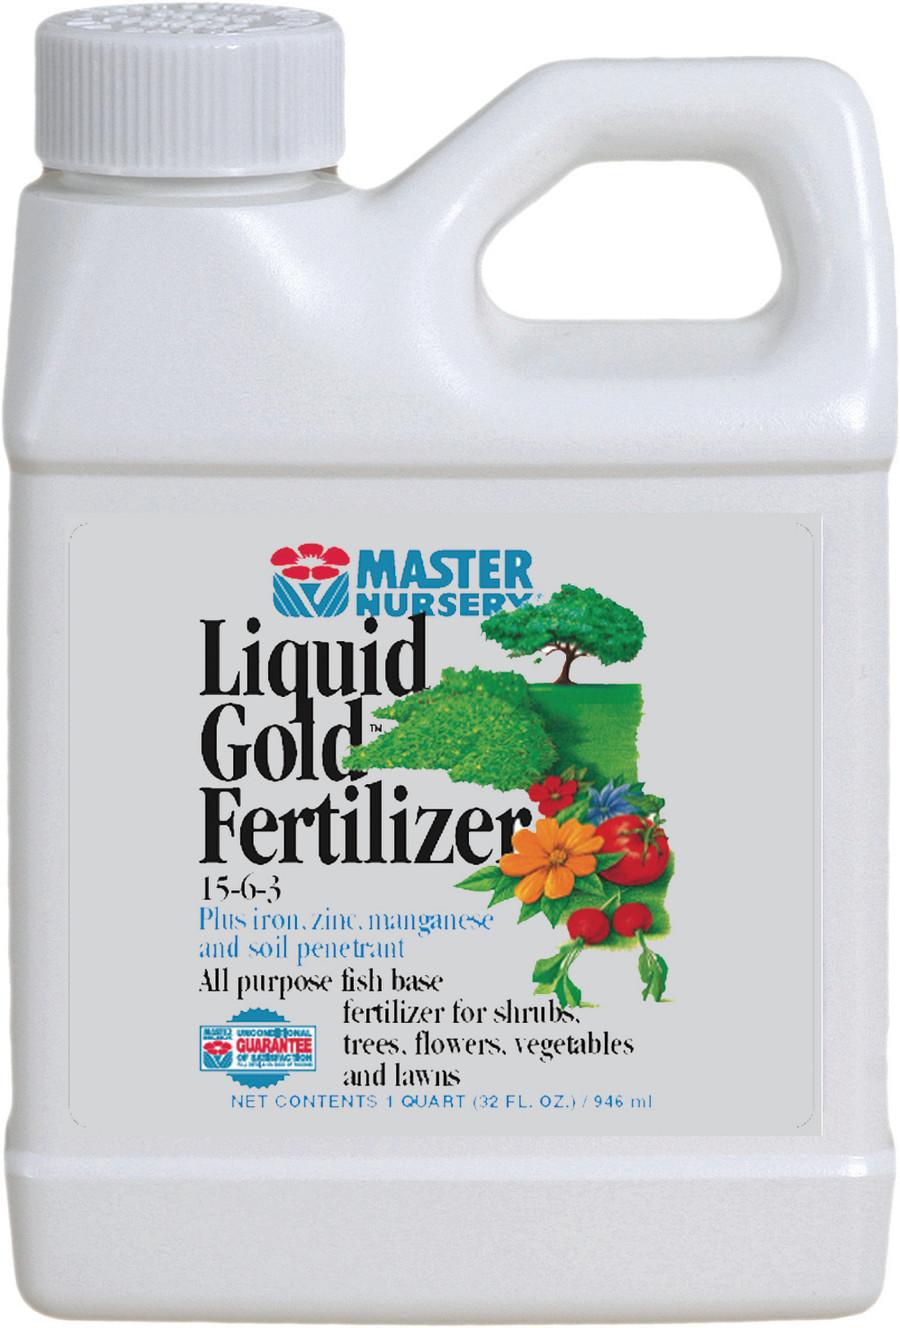 Master Nursery Liquid Gold 15-6-3 Fertilizer Concentrate